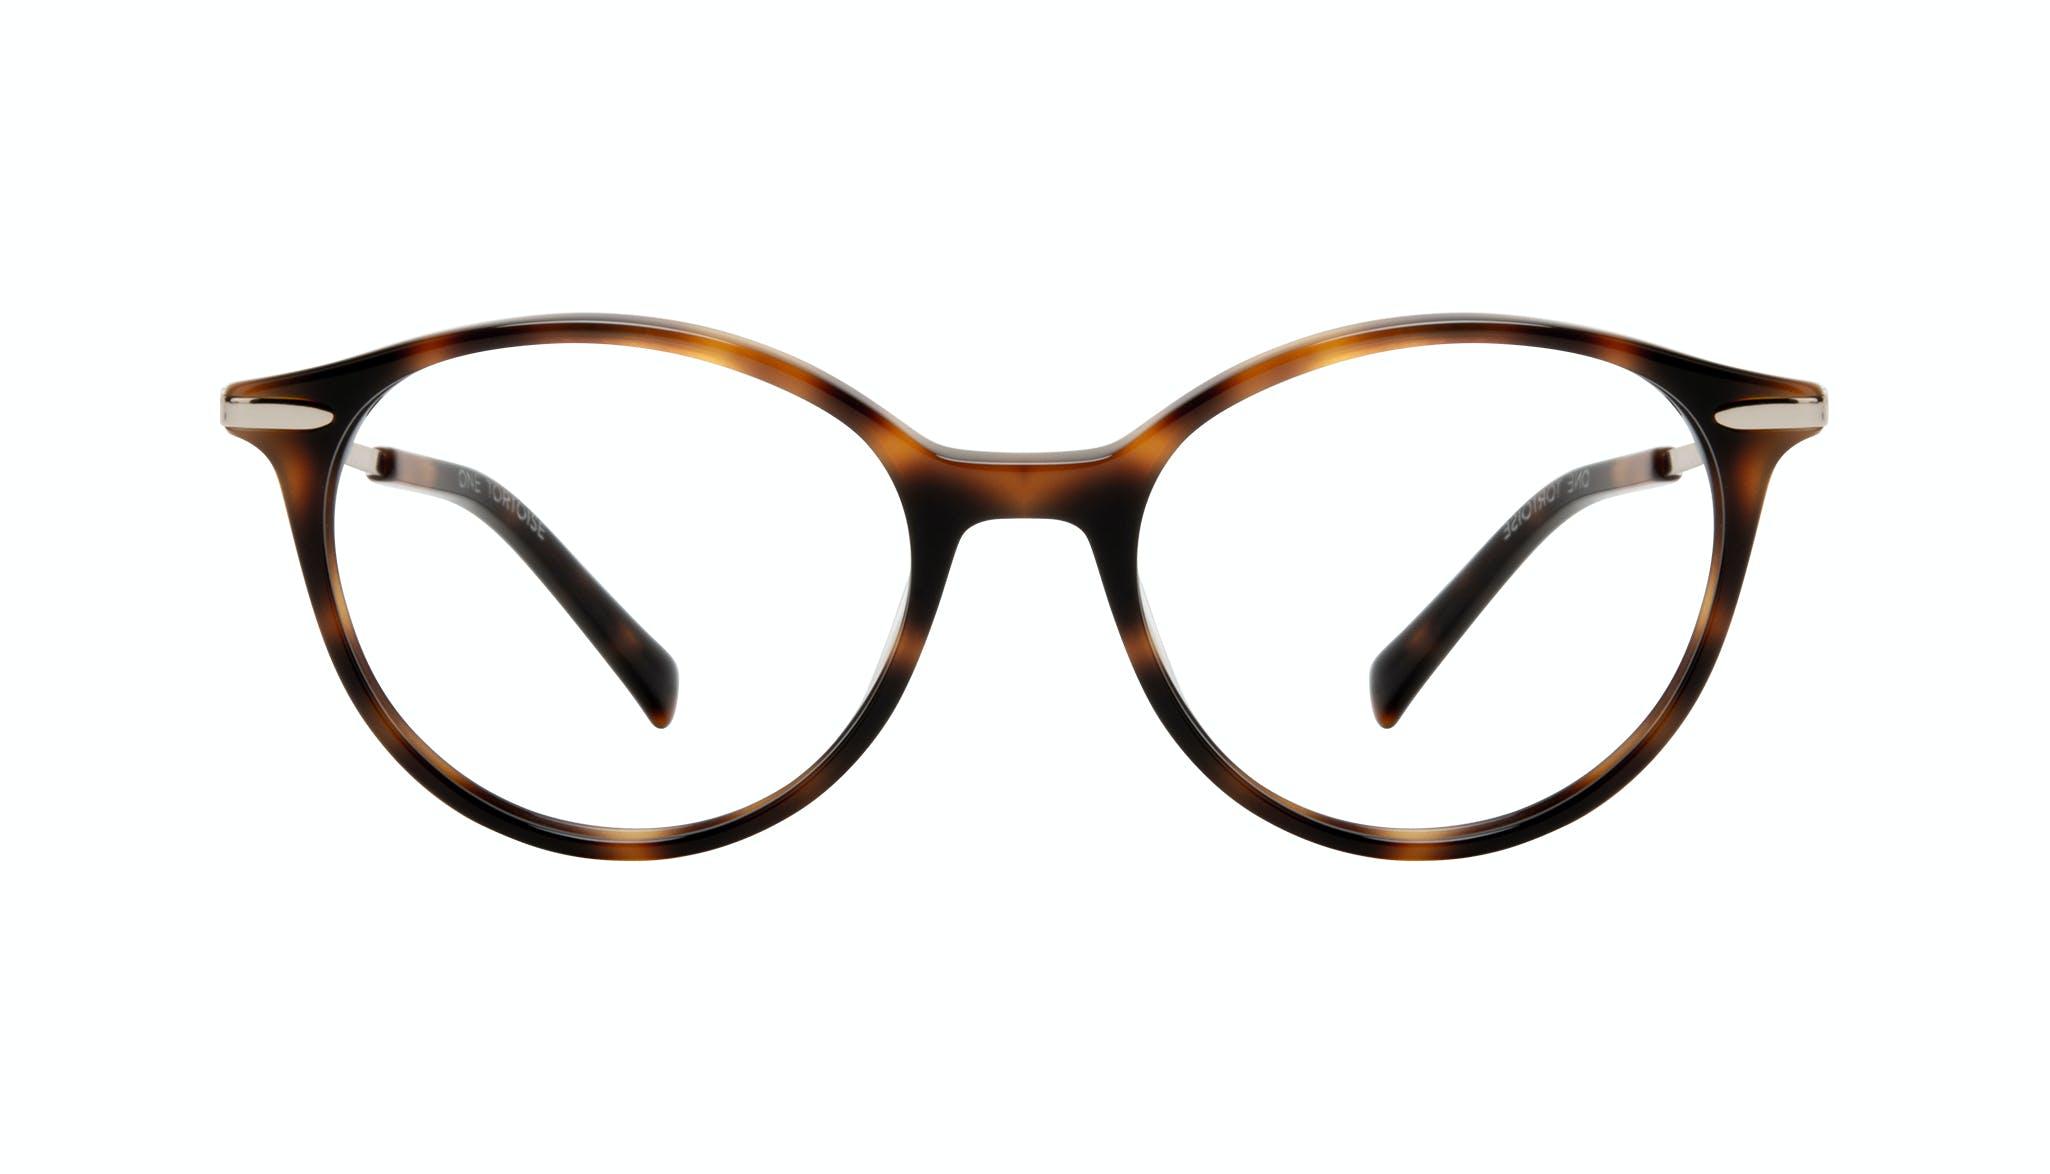 Affordable Fashion Glasses Round Eyeglasses Women One Tortoise Front